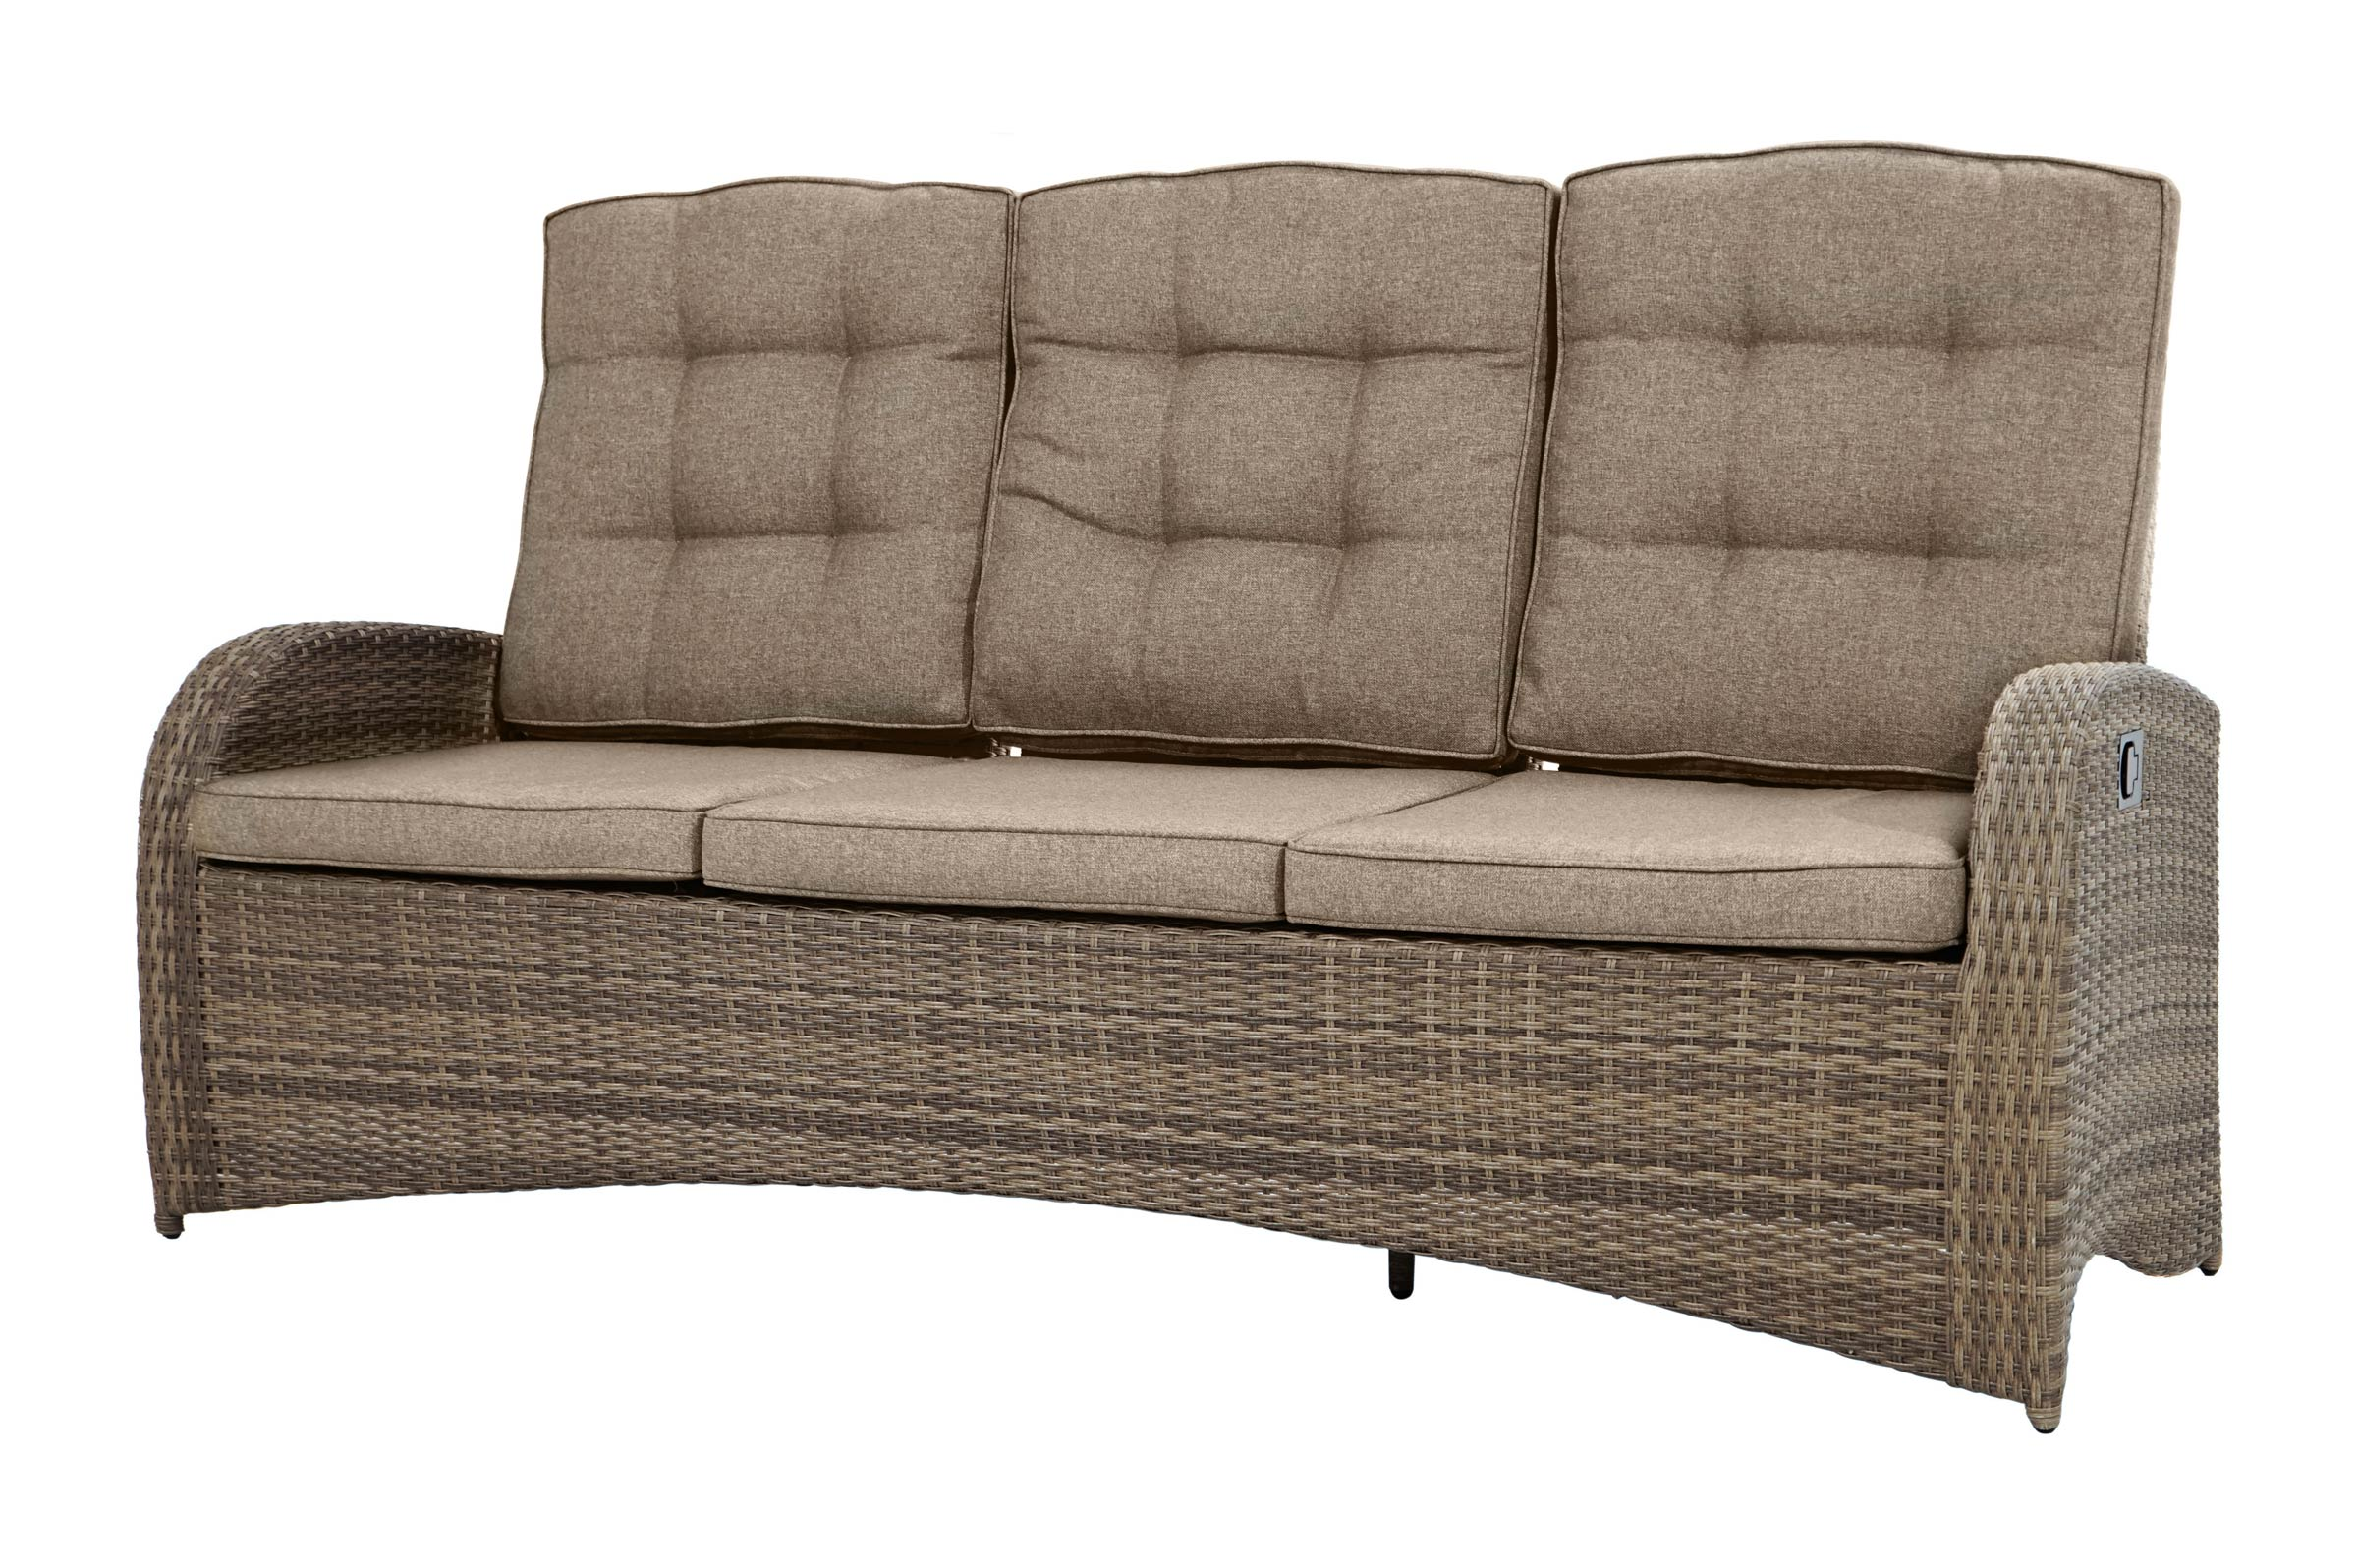 Full Size of Halbrundes Sofa Rot Samt Gebraucht Klein Schwarz Ebay Im Klassischen Stil Big Ikea Halbrunde Couch Plo Rabida Comfort Dining Lounge 3 Sitzer Abnehmbarer Bezug Sofa Halbrundes Sofa